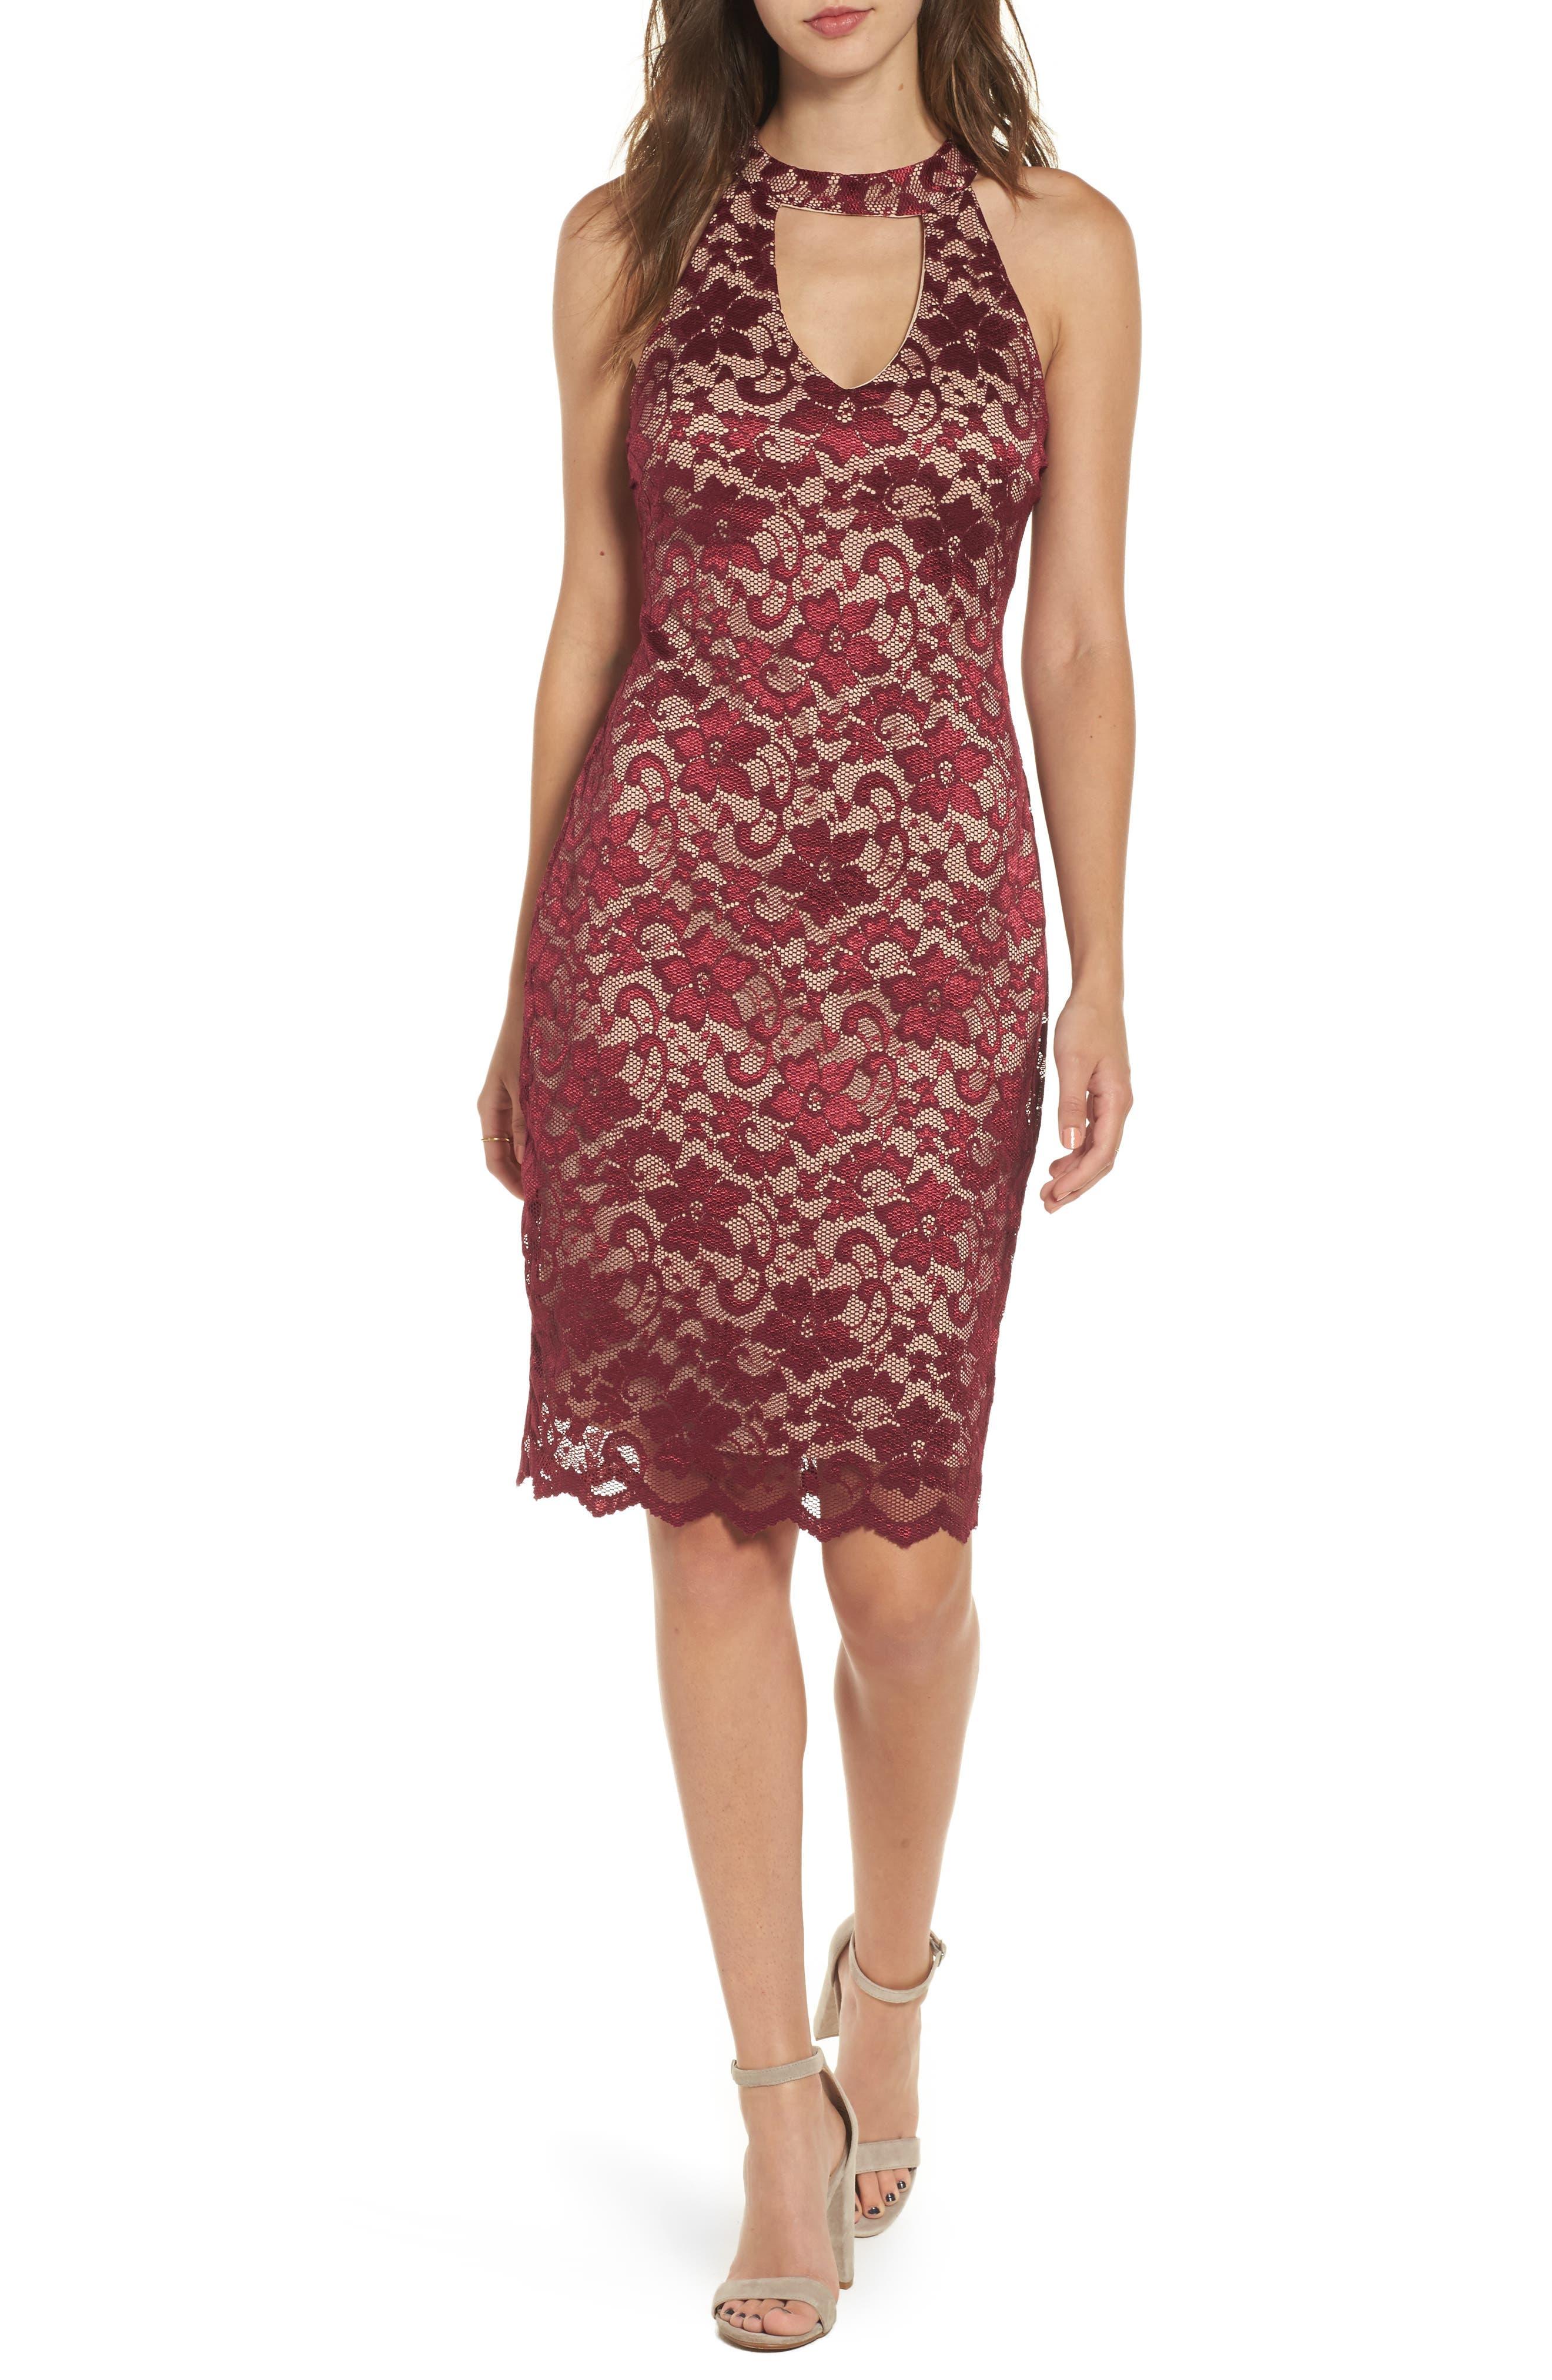 Love Nickie Lew Lace Choker Body Con Dress